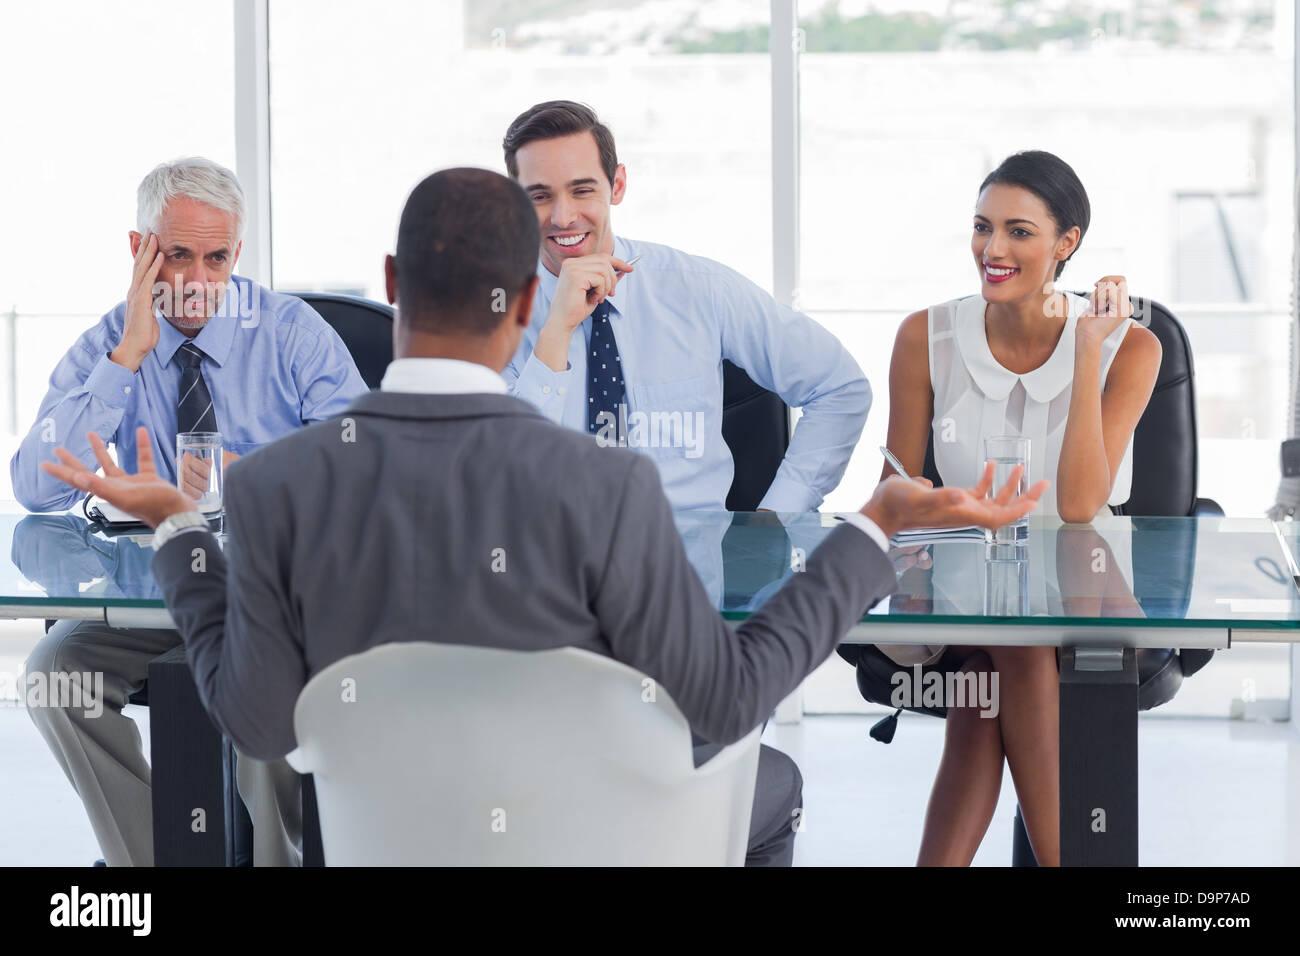 Man gesturing during an job interview - Stock Image